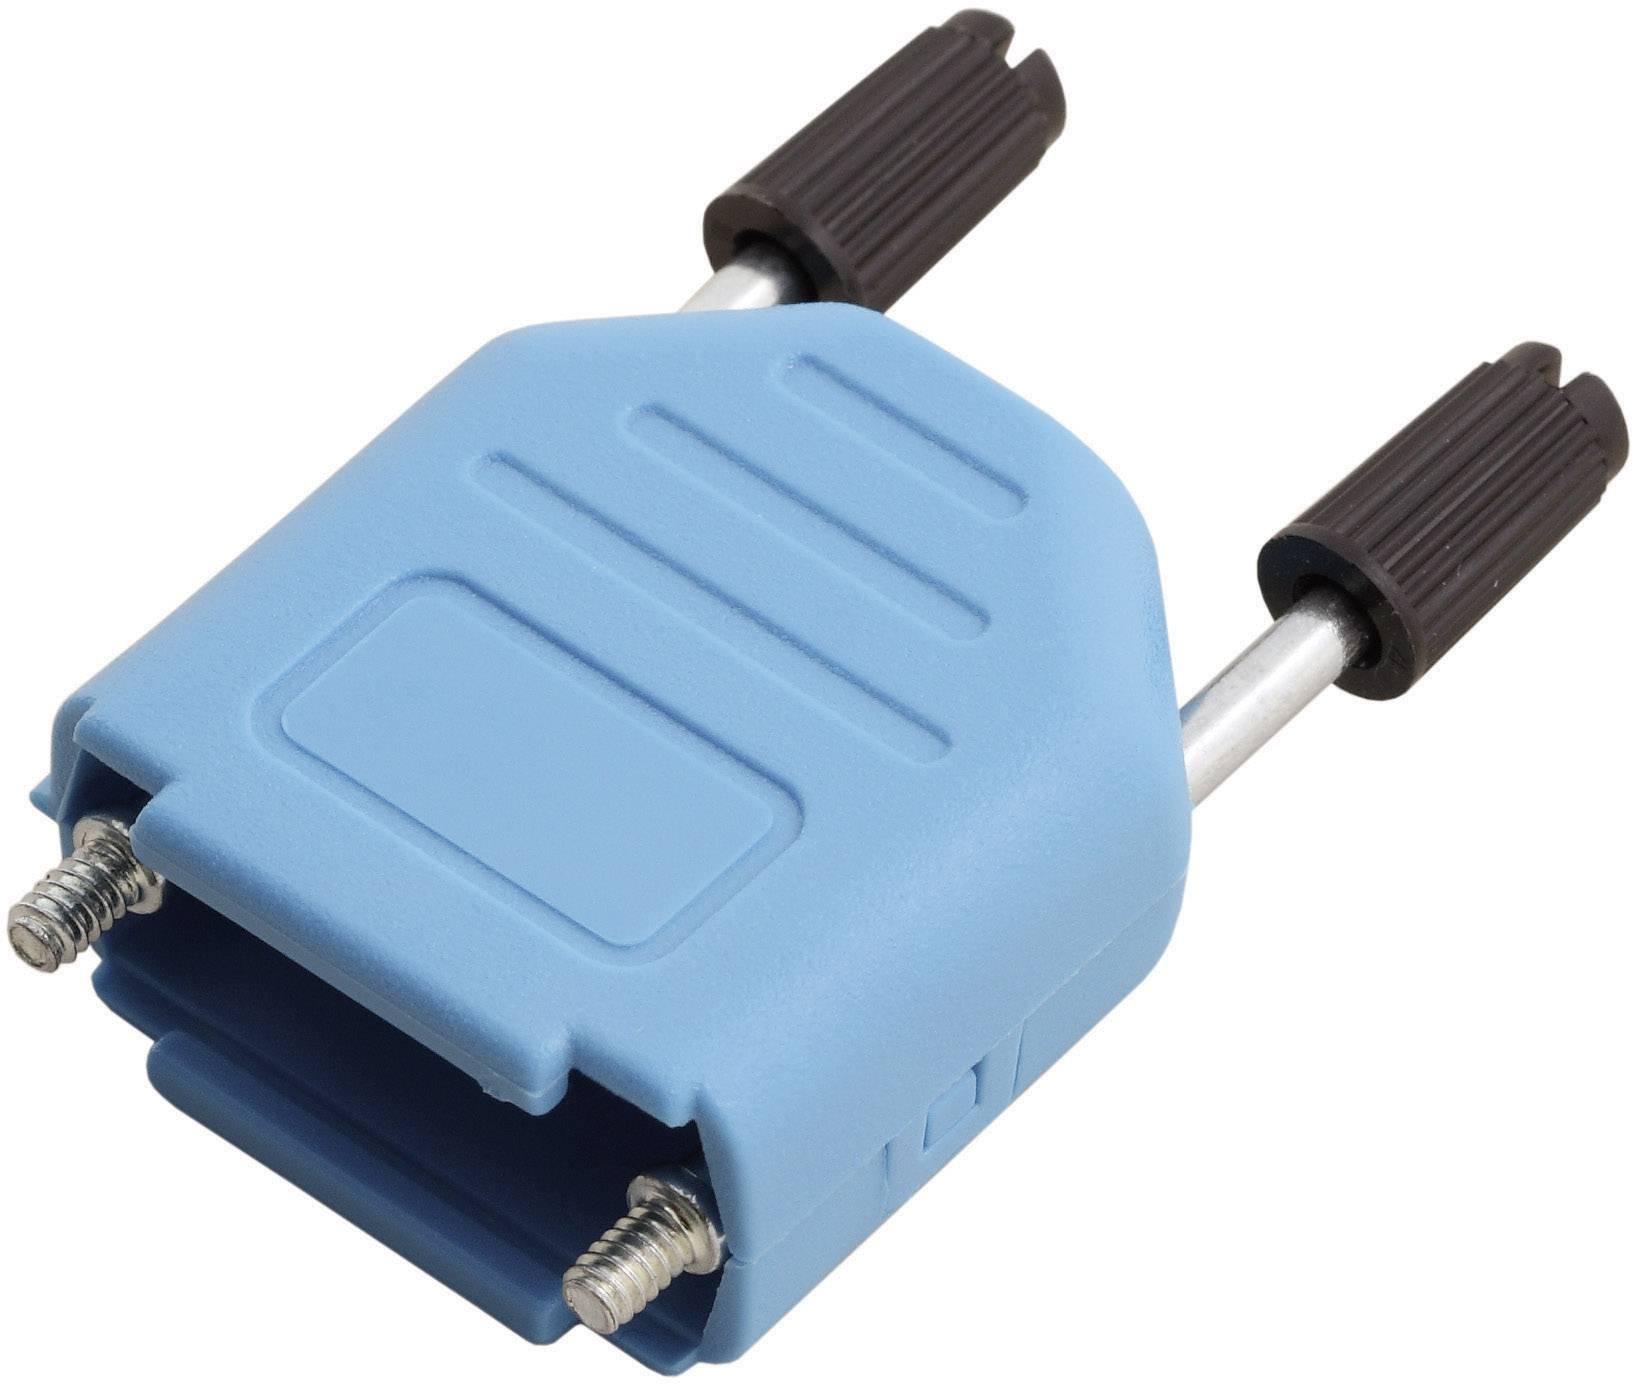 D-SUB púzdro MH Connectors MHDPPK15-B-K 6353-0104-02, Počet pinov: 15, plast, 180 °, modrá, 1 ks